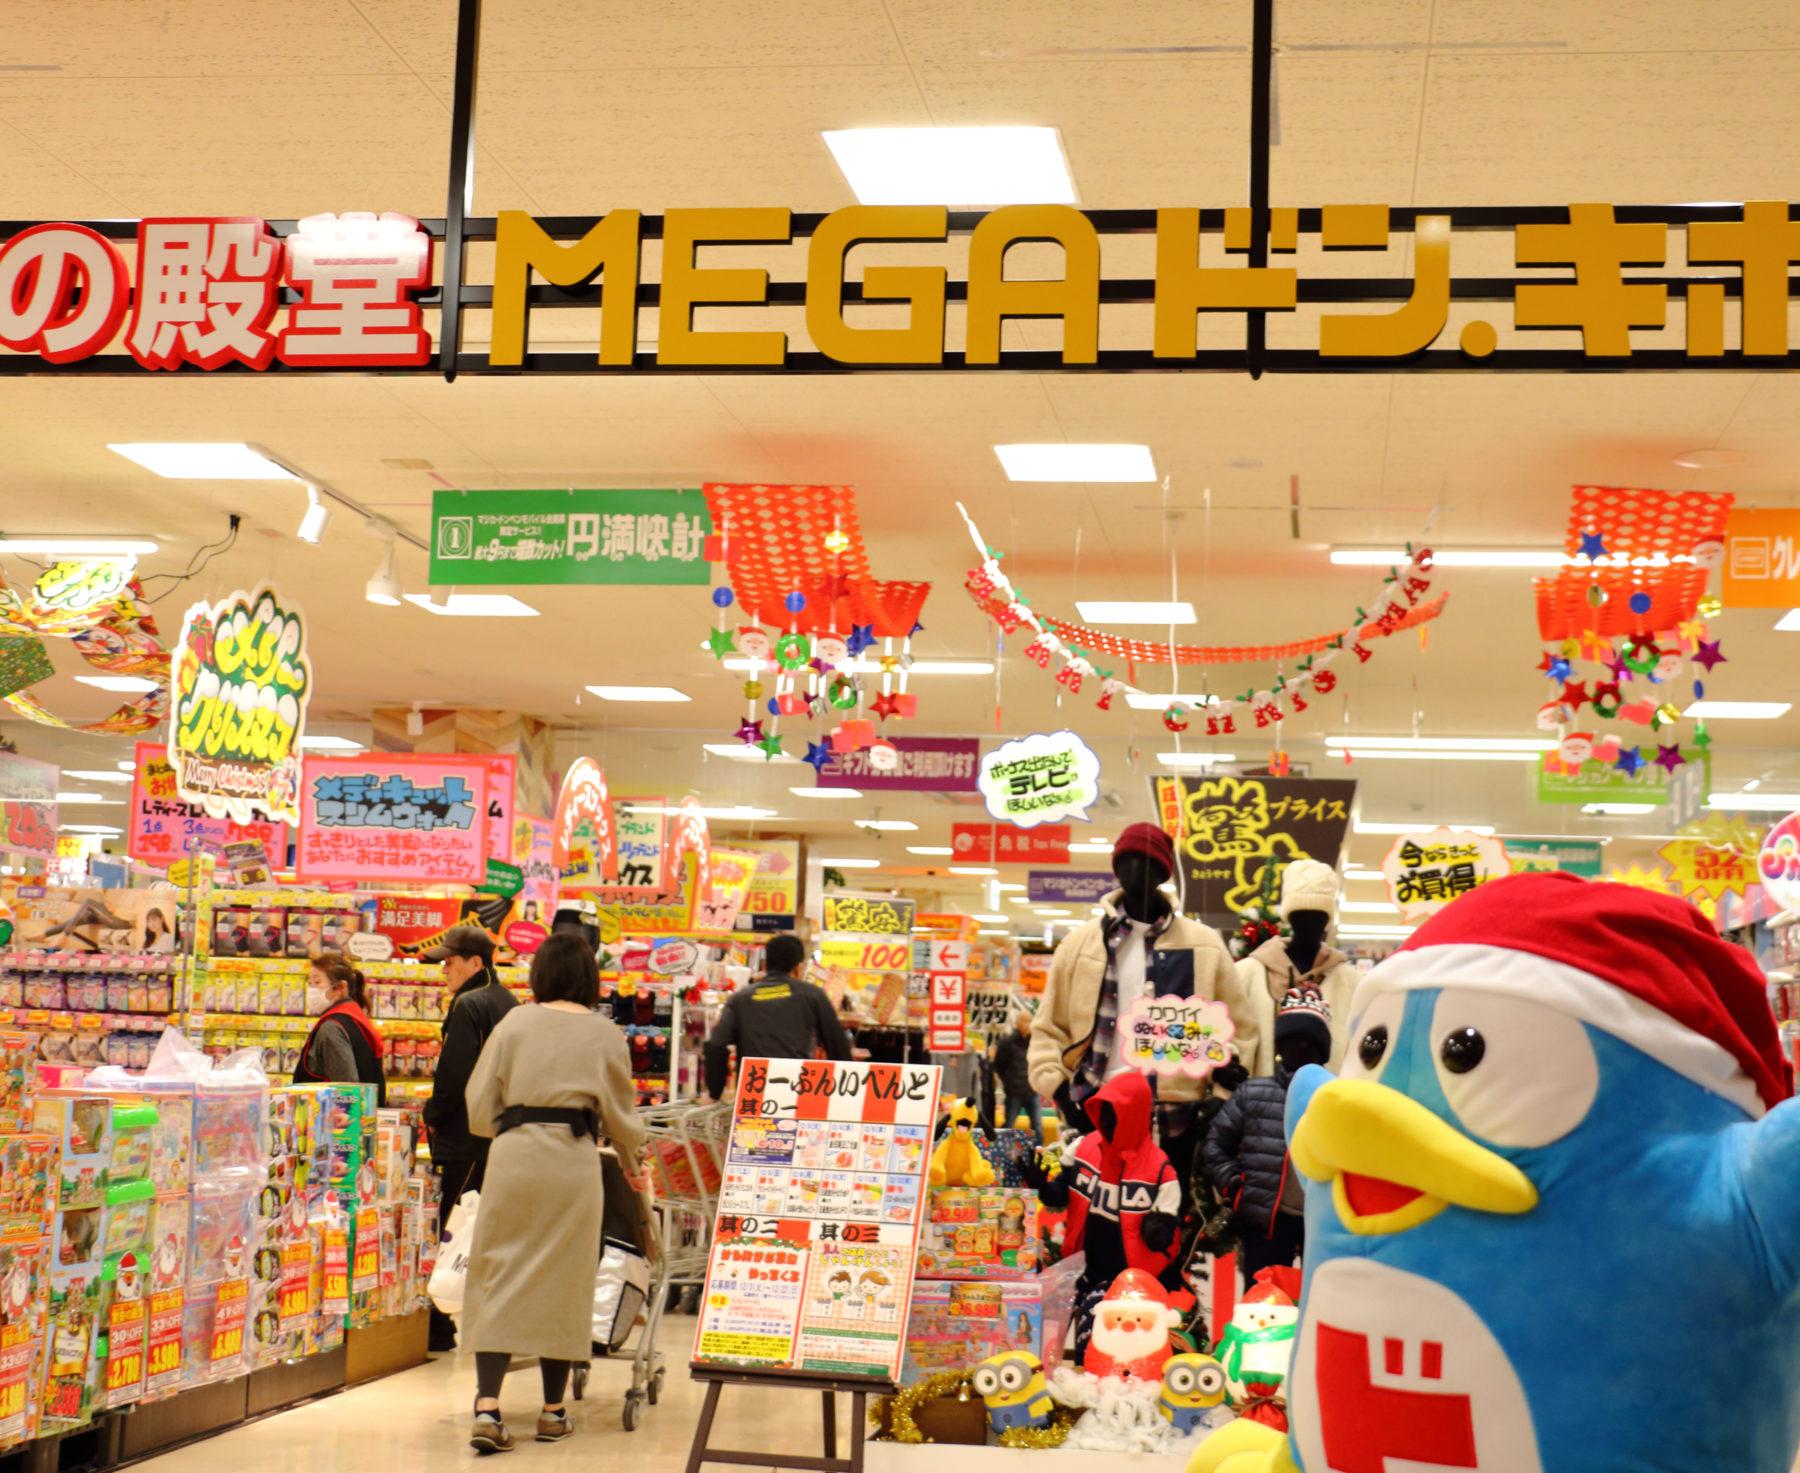 【Open】ファミリー層も大喜び!! 生鮮食品も驚安で買い物が楽しいドンキが爆誕|MEGAドン・キホーテUNY福井店